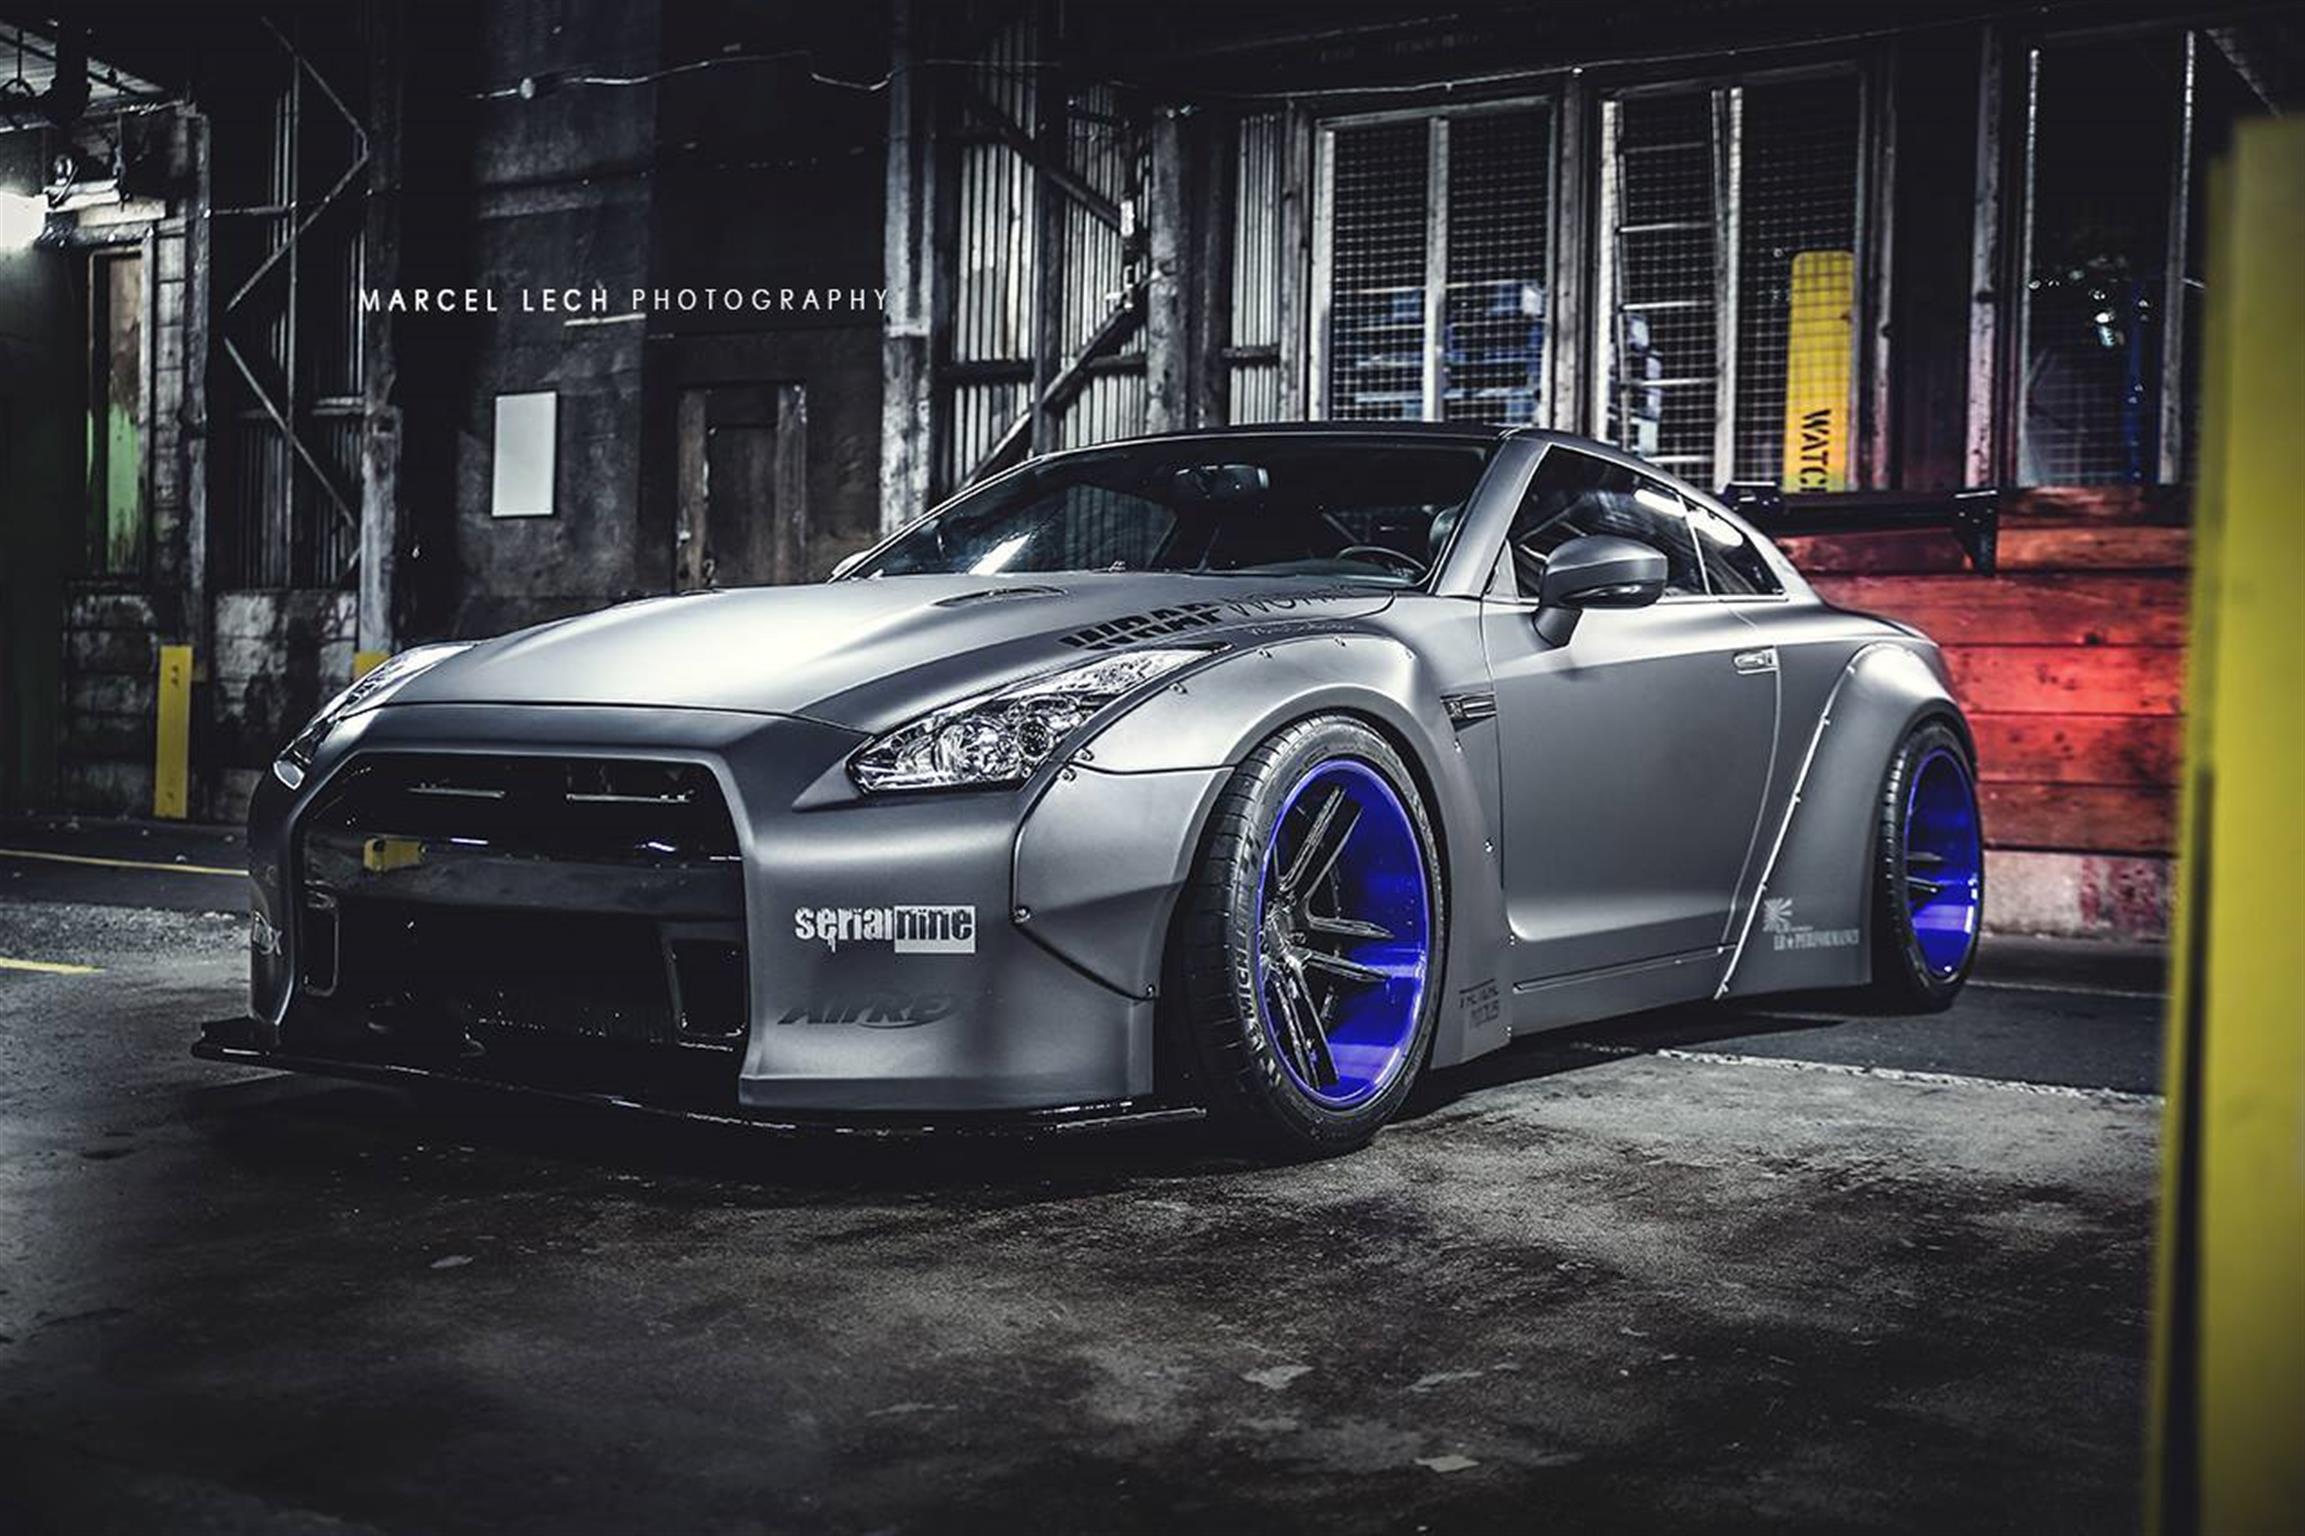 Nissan - GT-R -  - Paint -  Wraps & Body - Performance